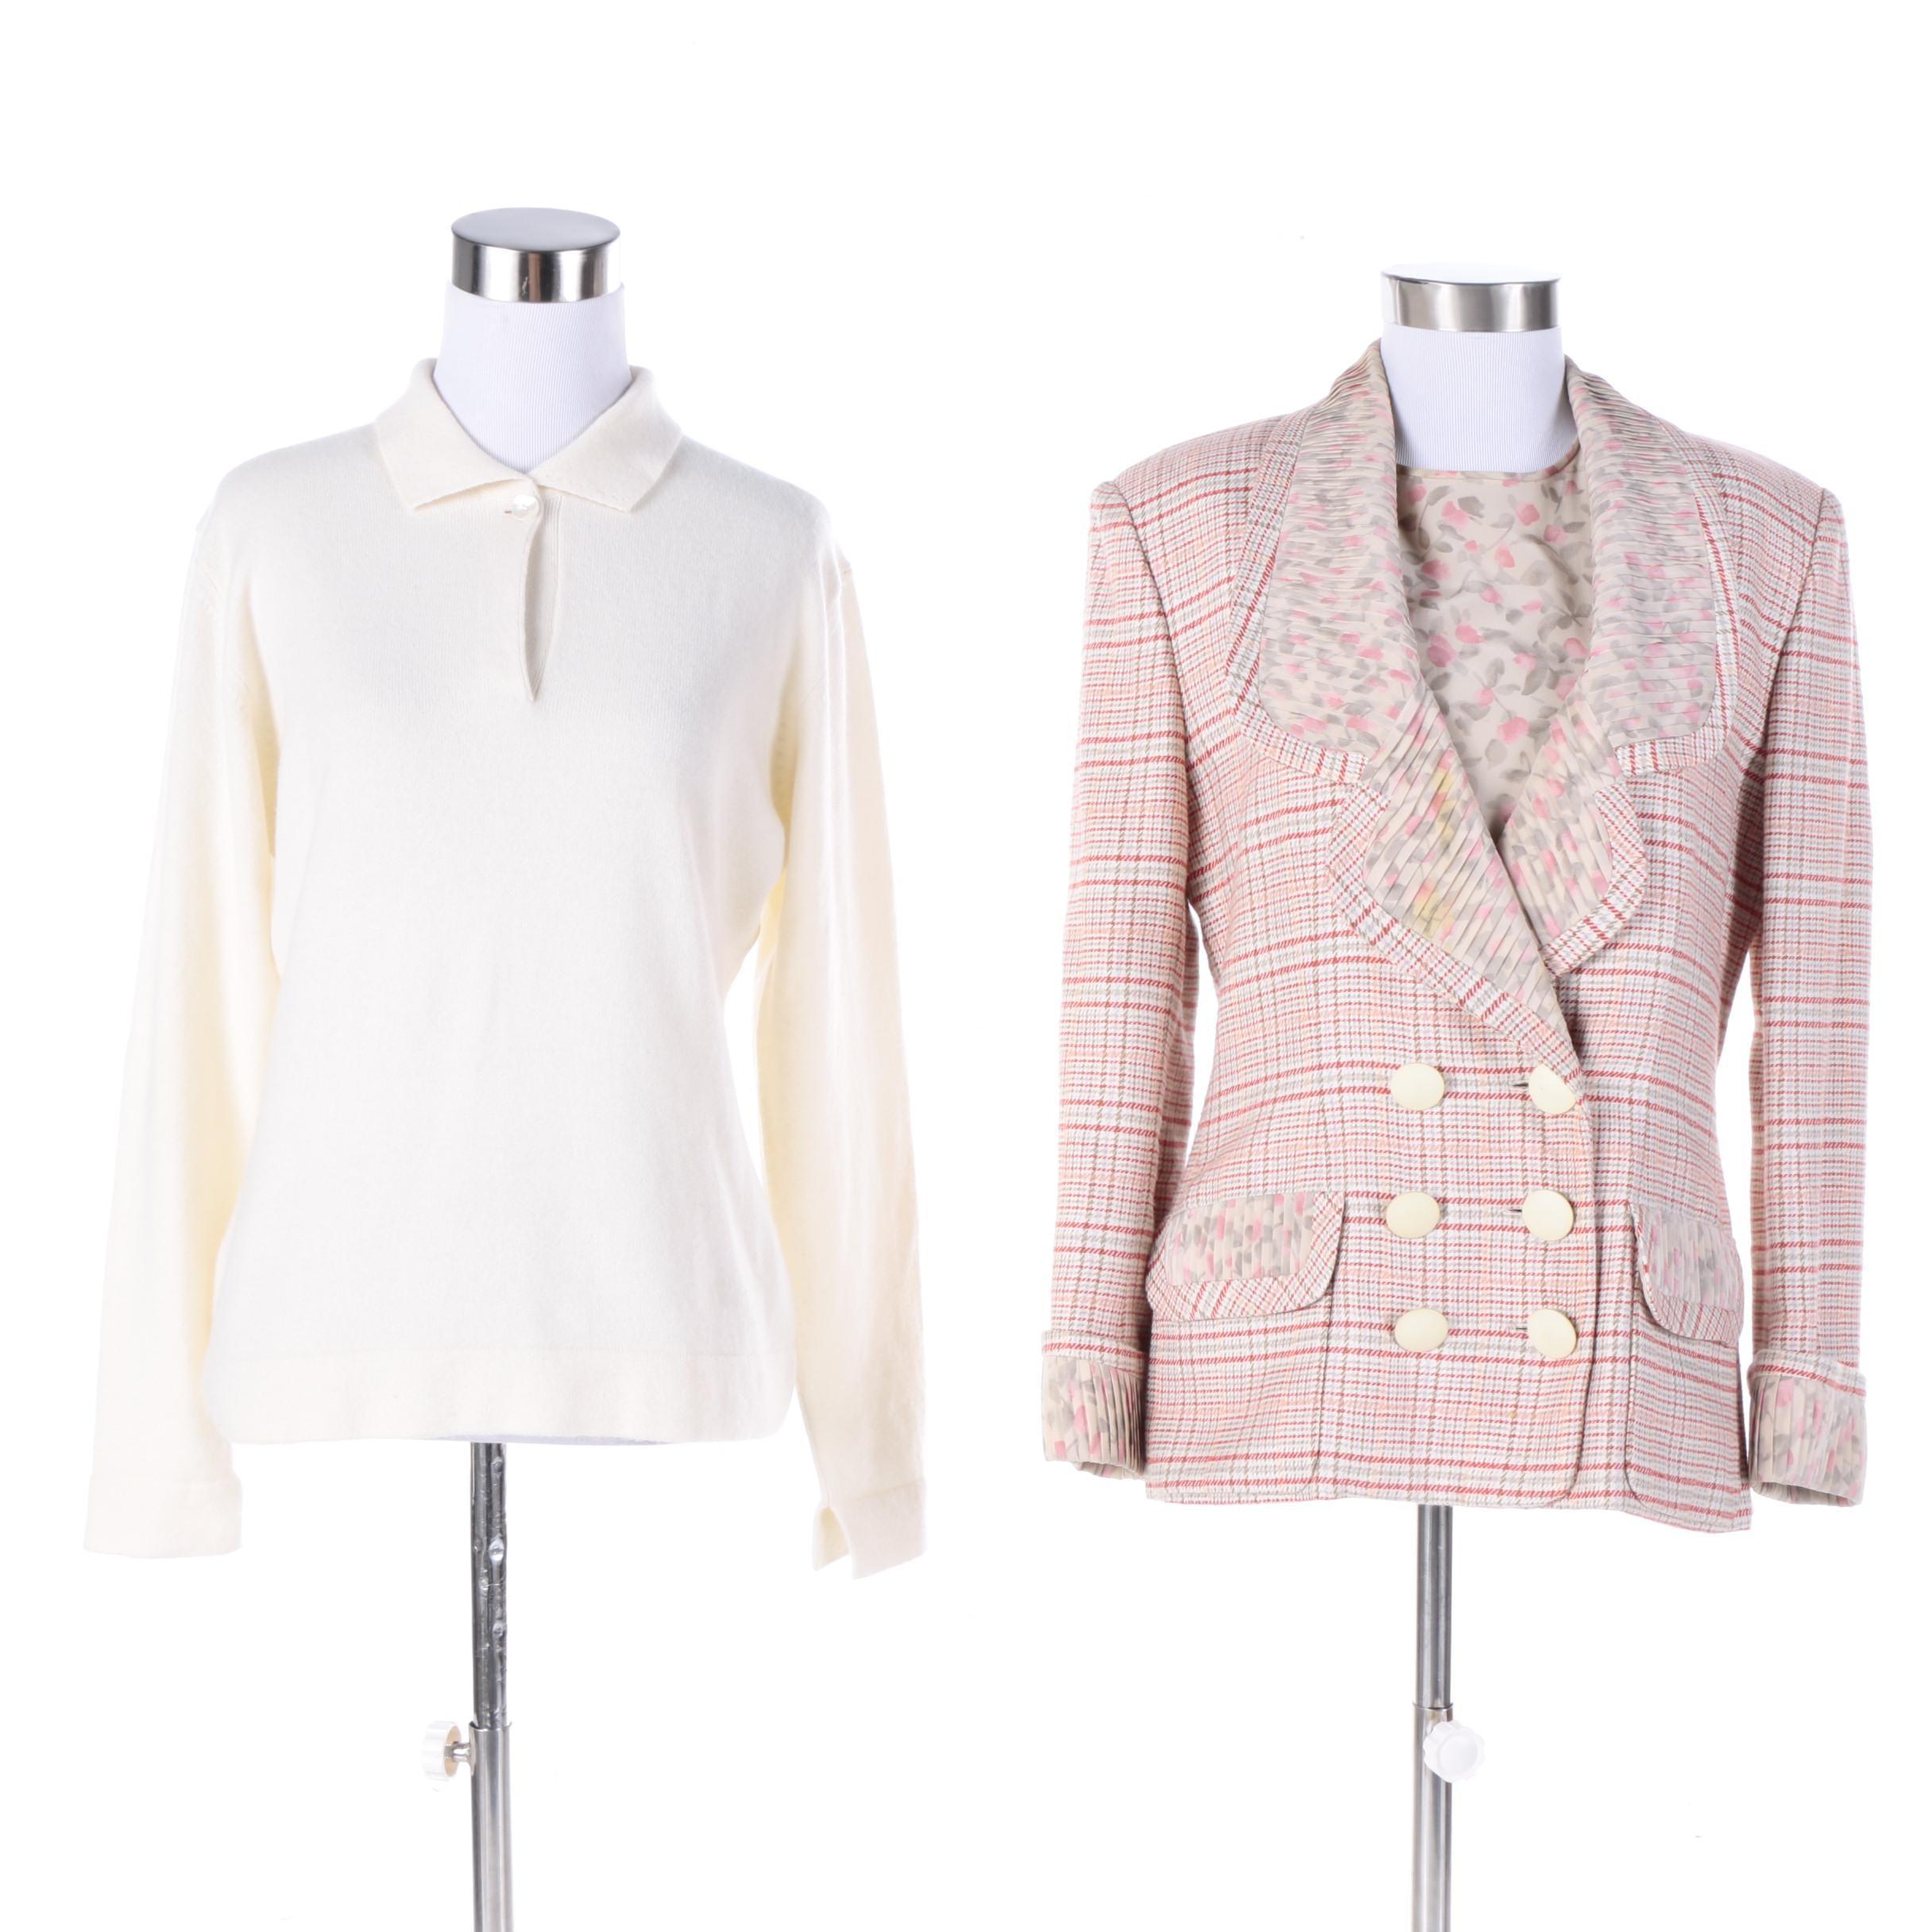 Women's Saks Fifth Avenue Clothing